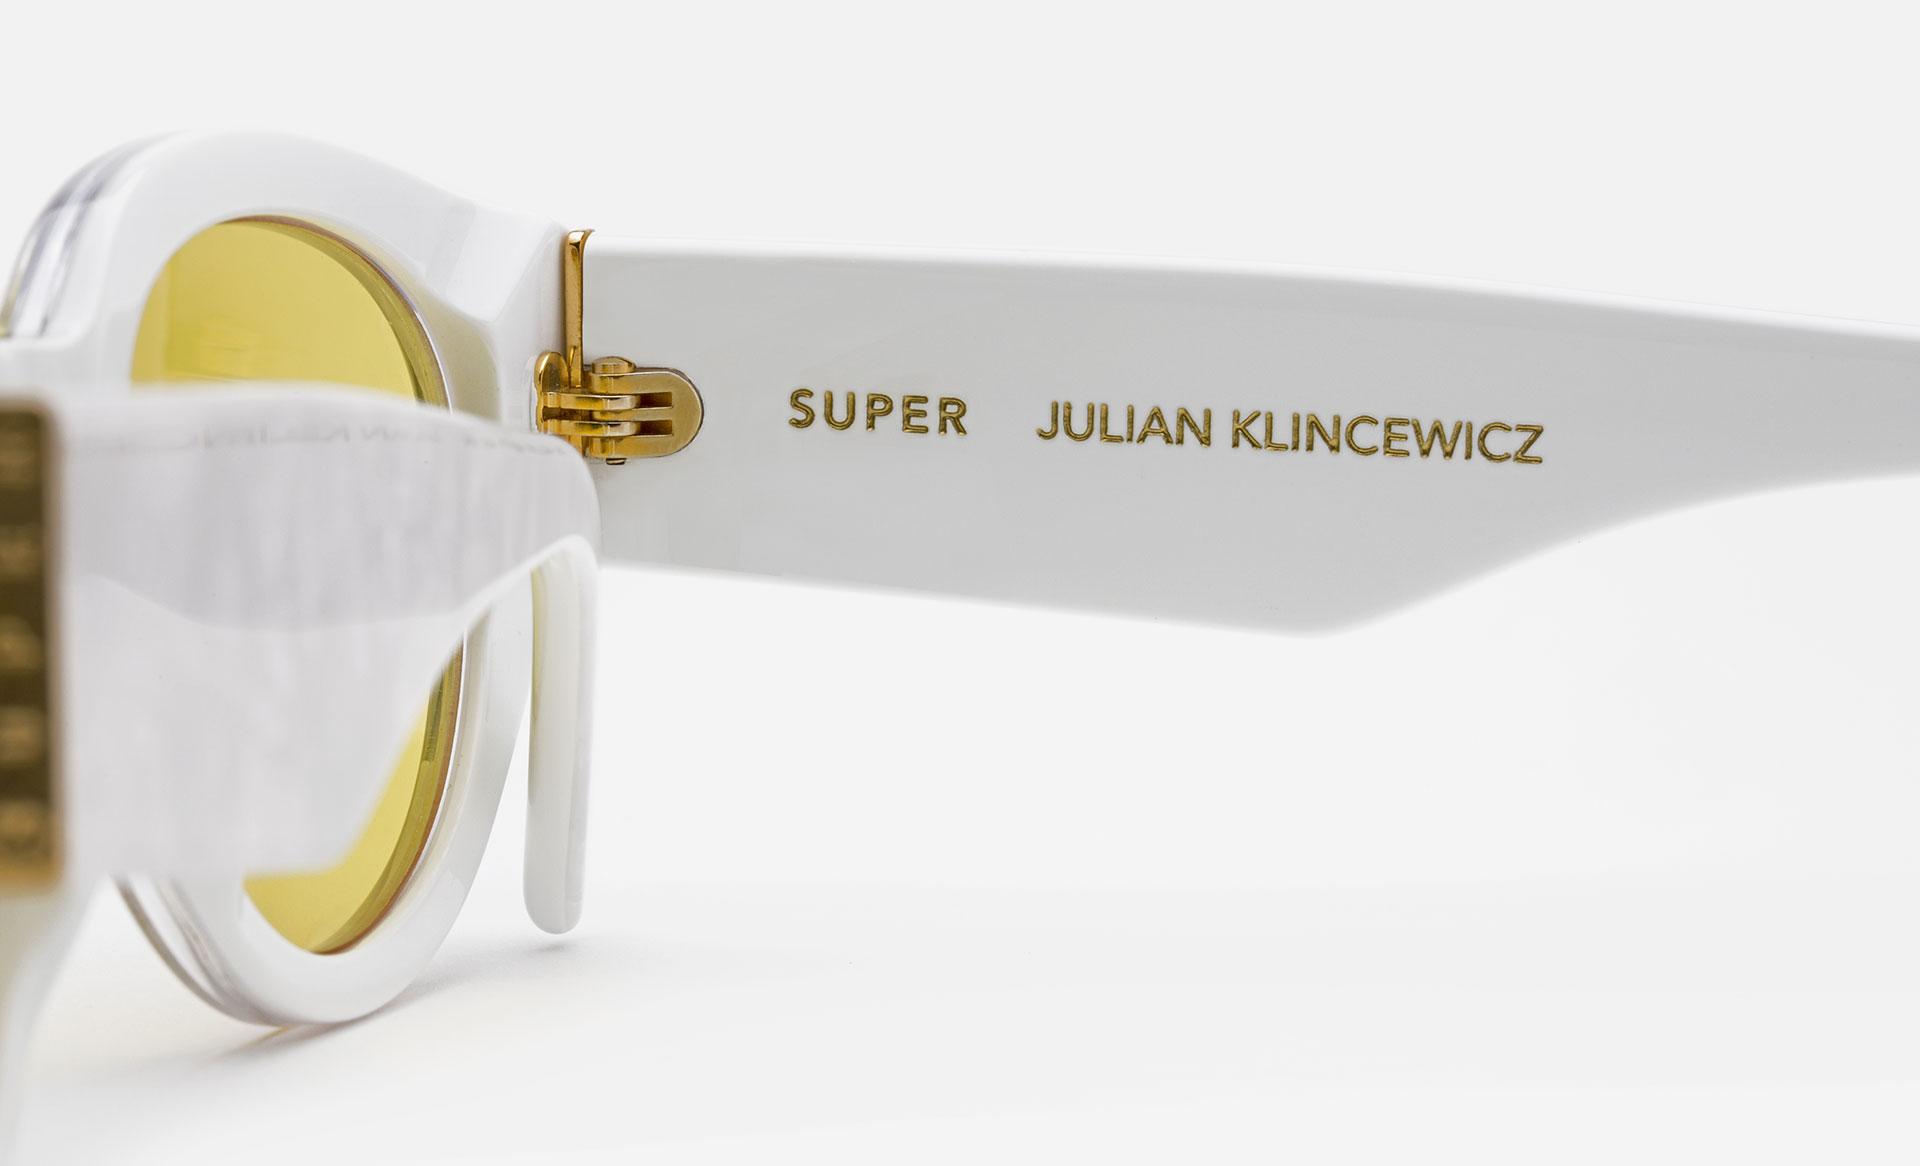 SUPER / Julian Klincewicz